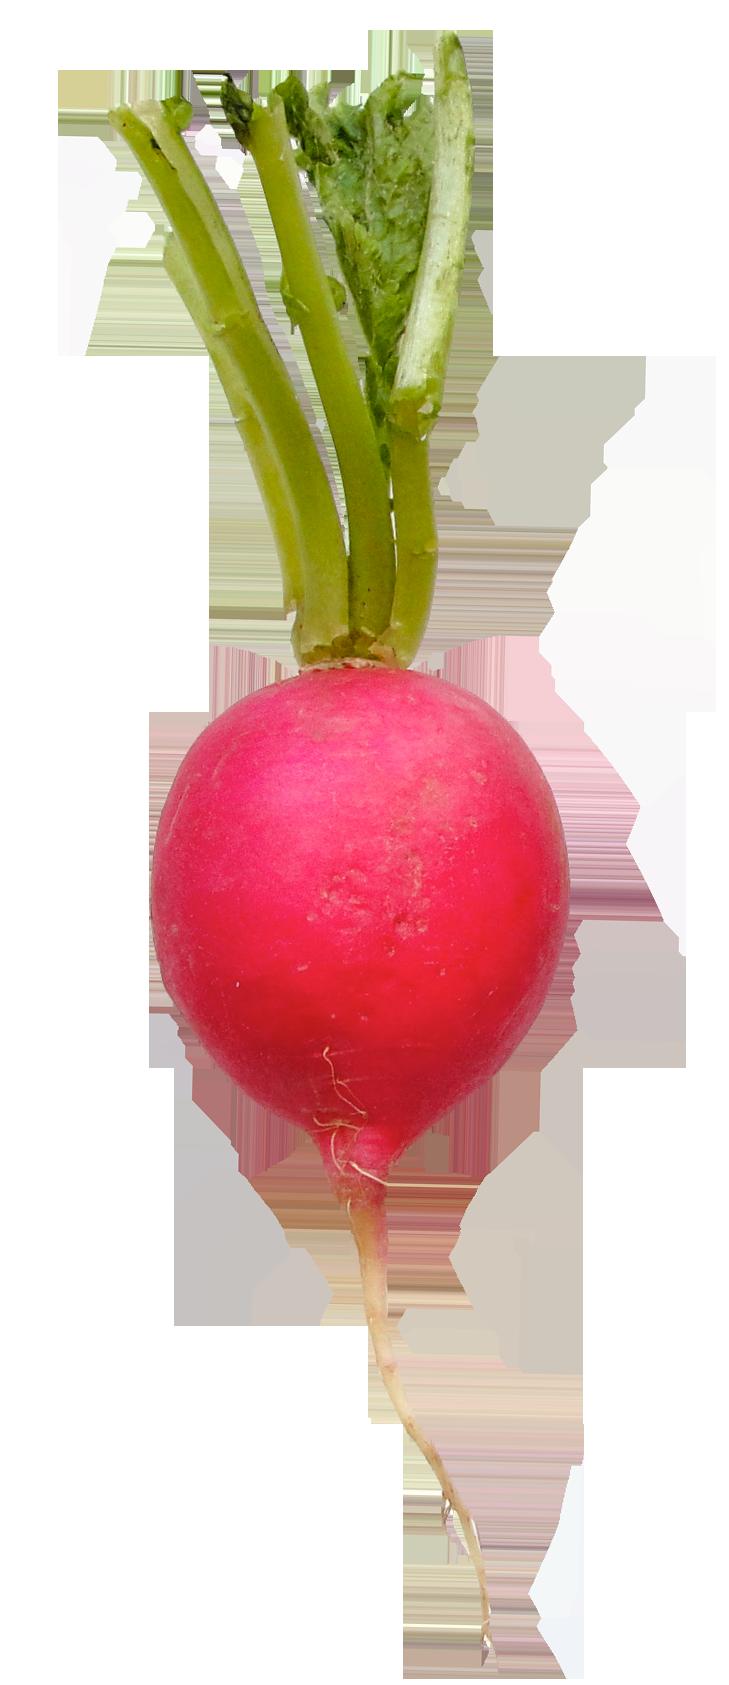 Radish PNG Image